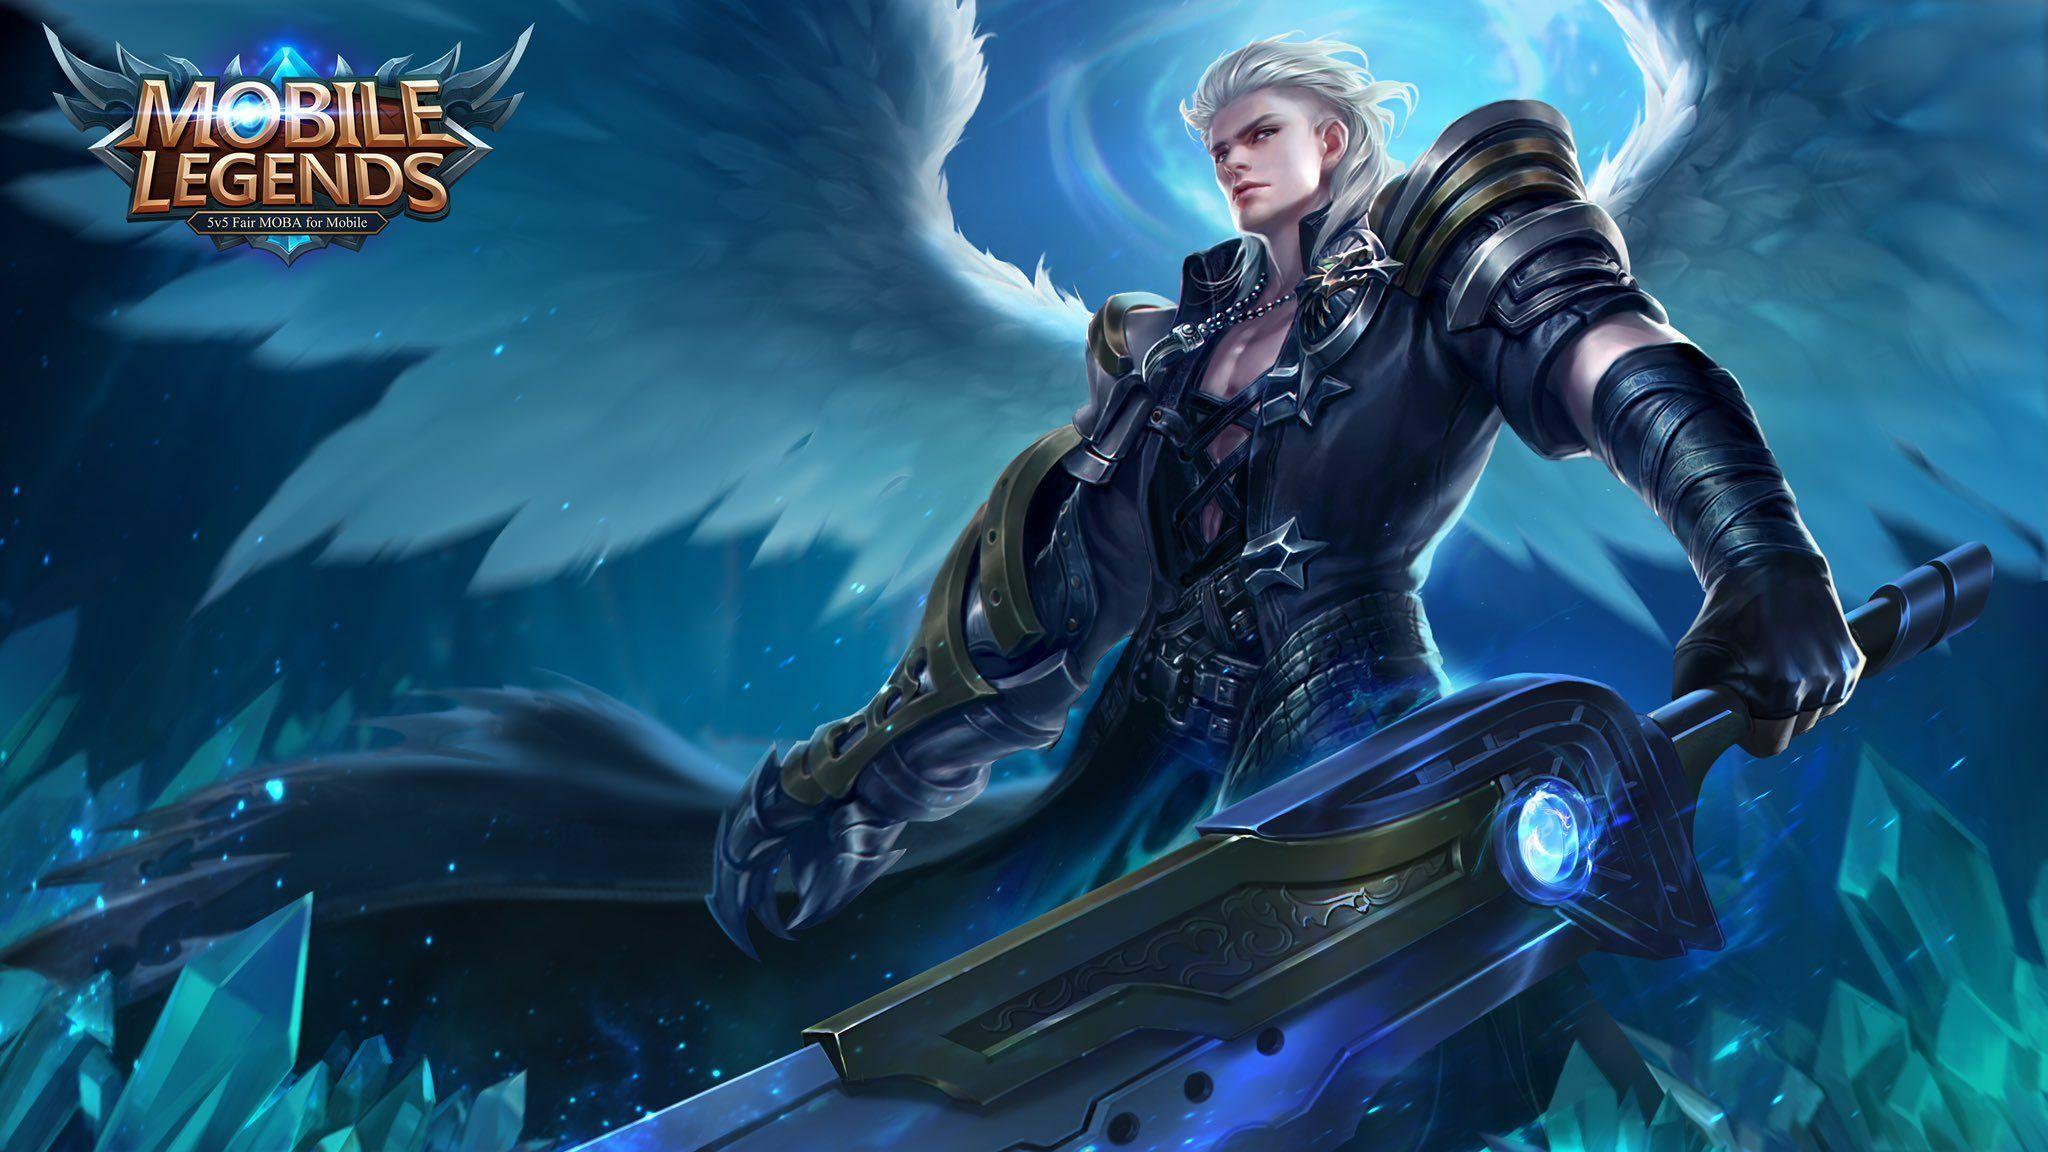 Guide Hero Fighter Mobile Legends 5